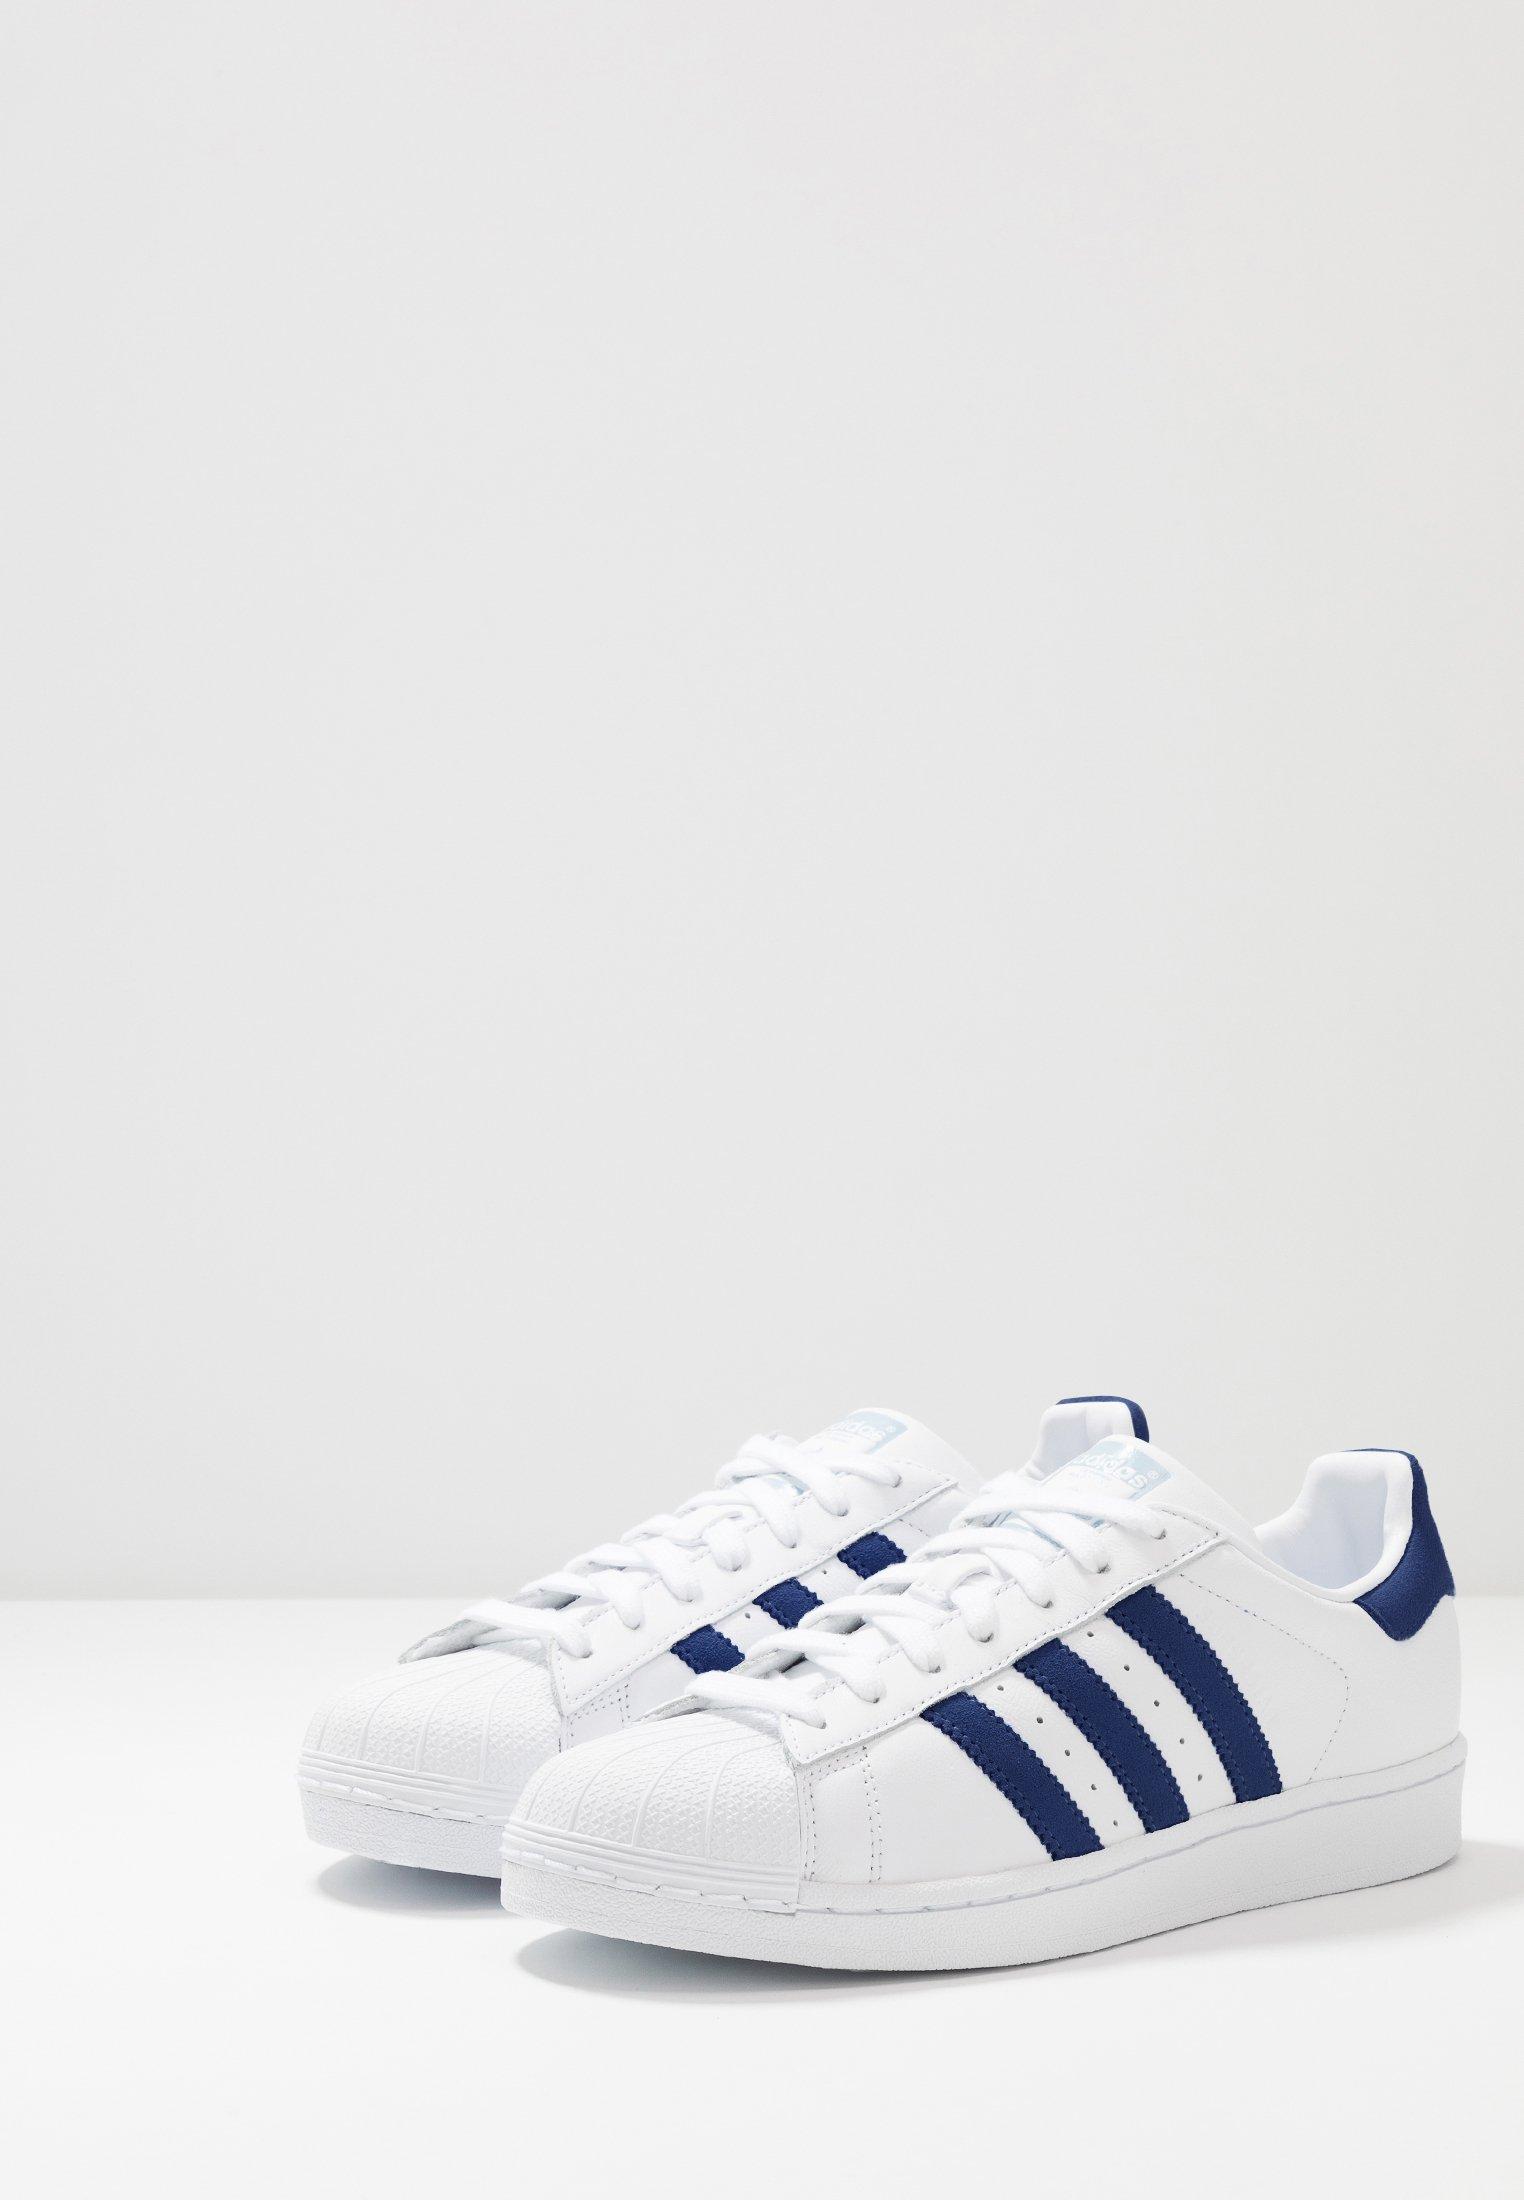 blue white Originals glow basses footwear adidas SUPERSTARBaskets txdChQrs